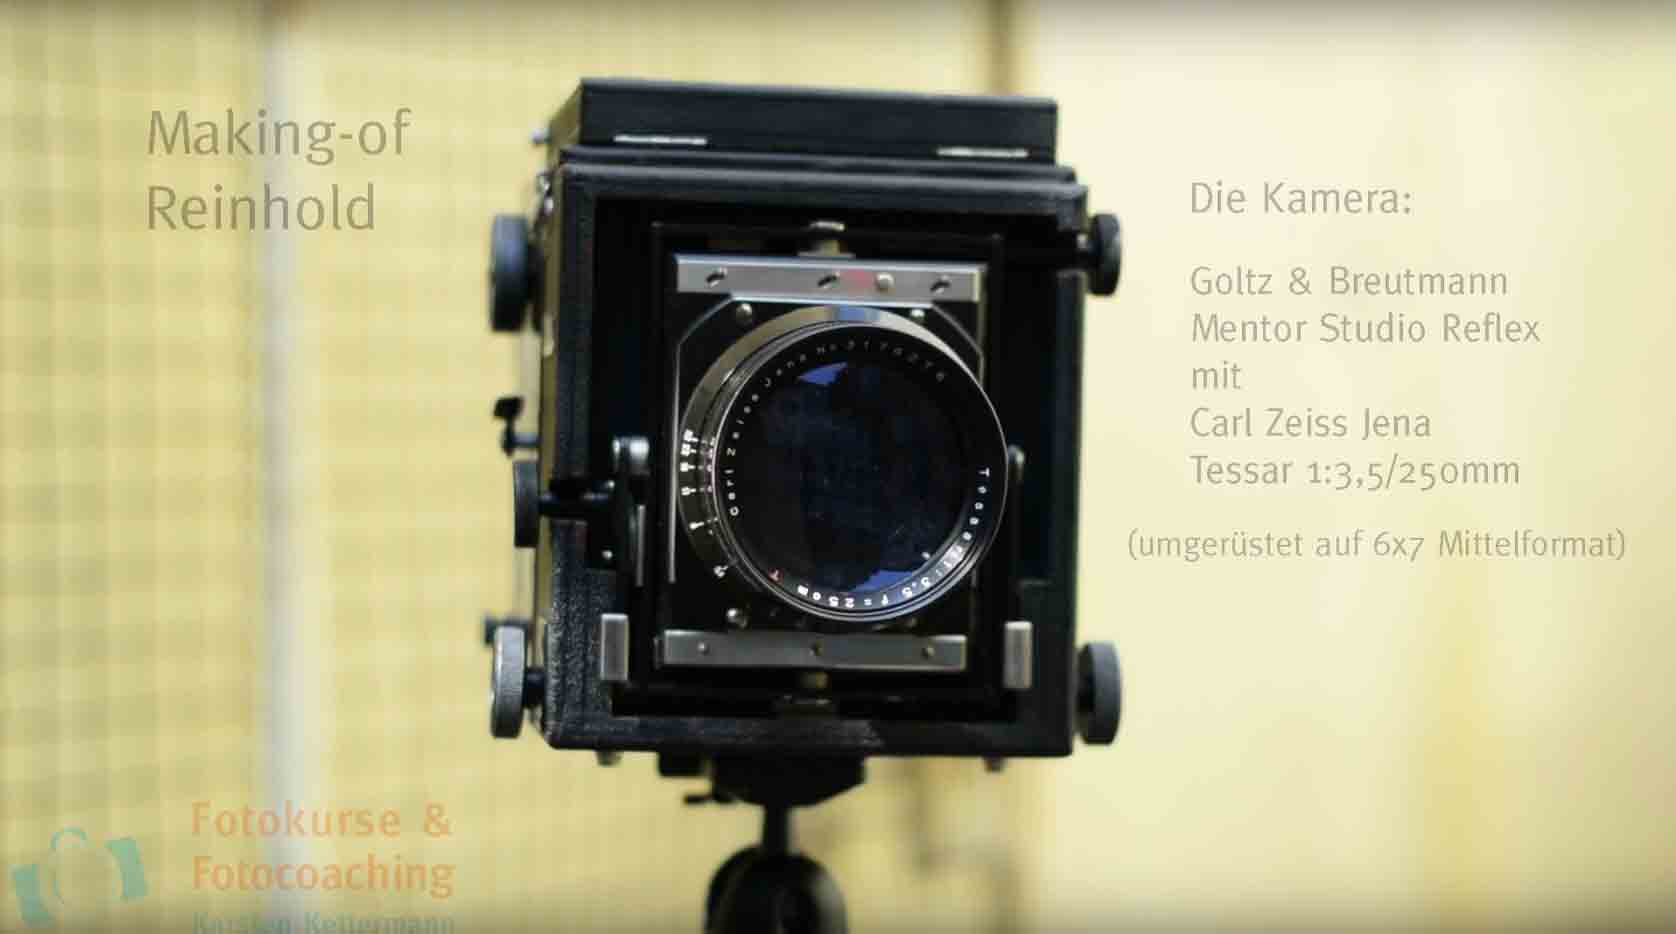 goltz-breutmann-mentor-studio-reflex